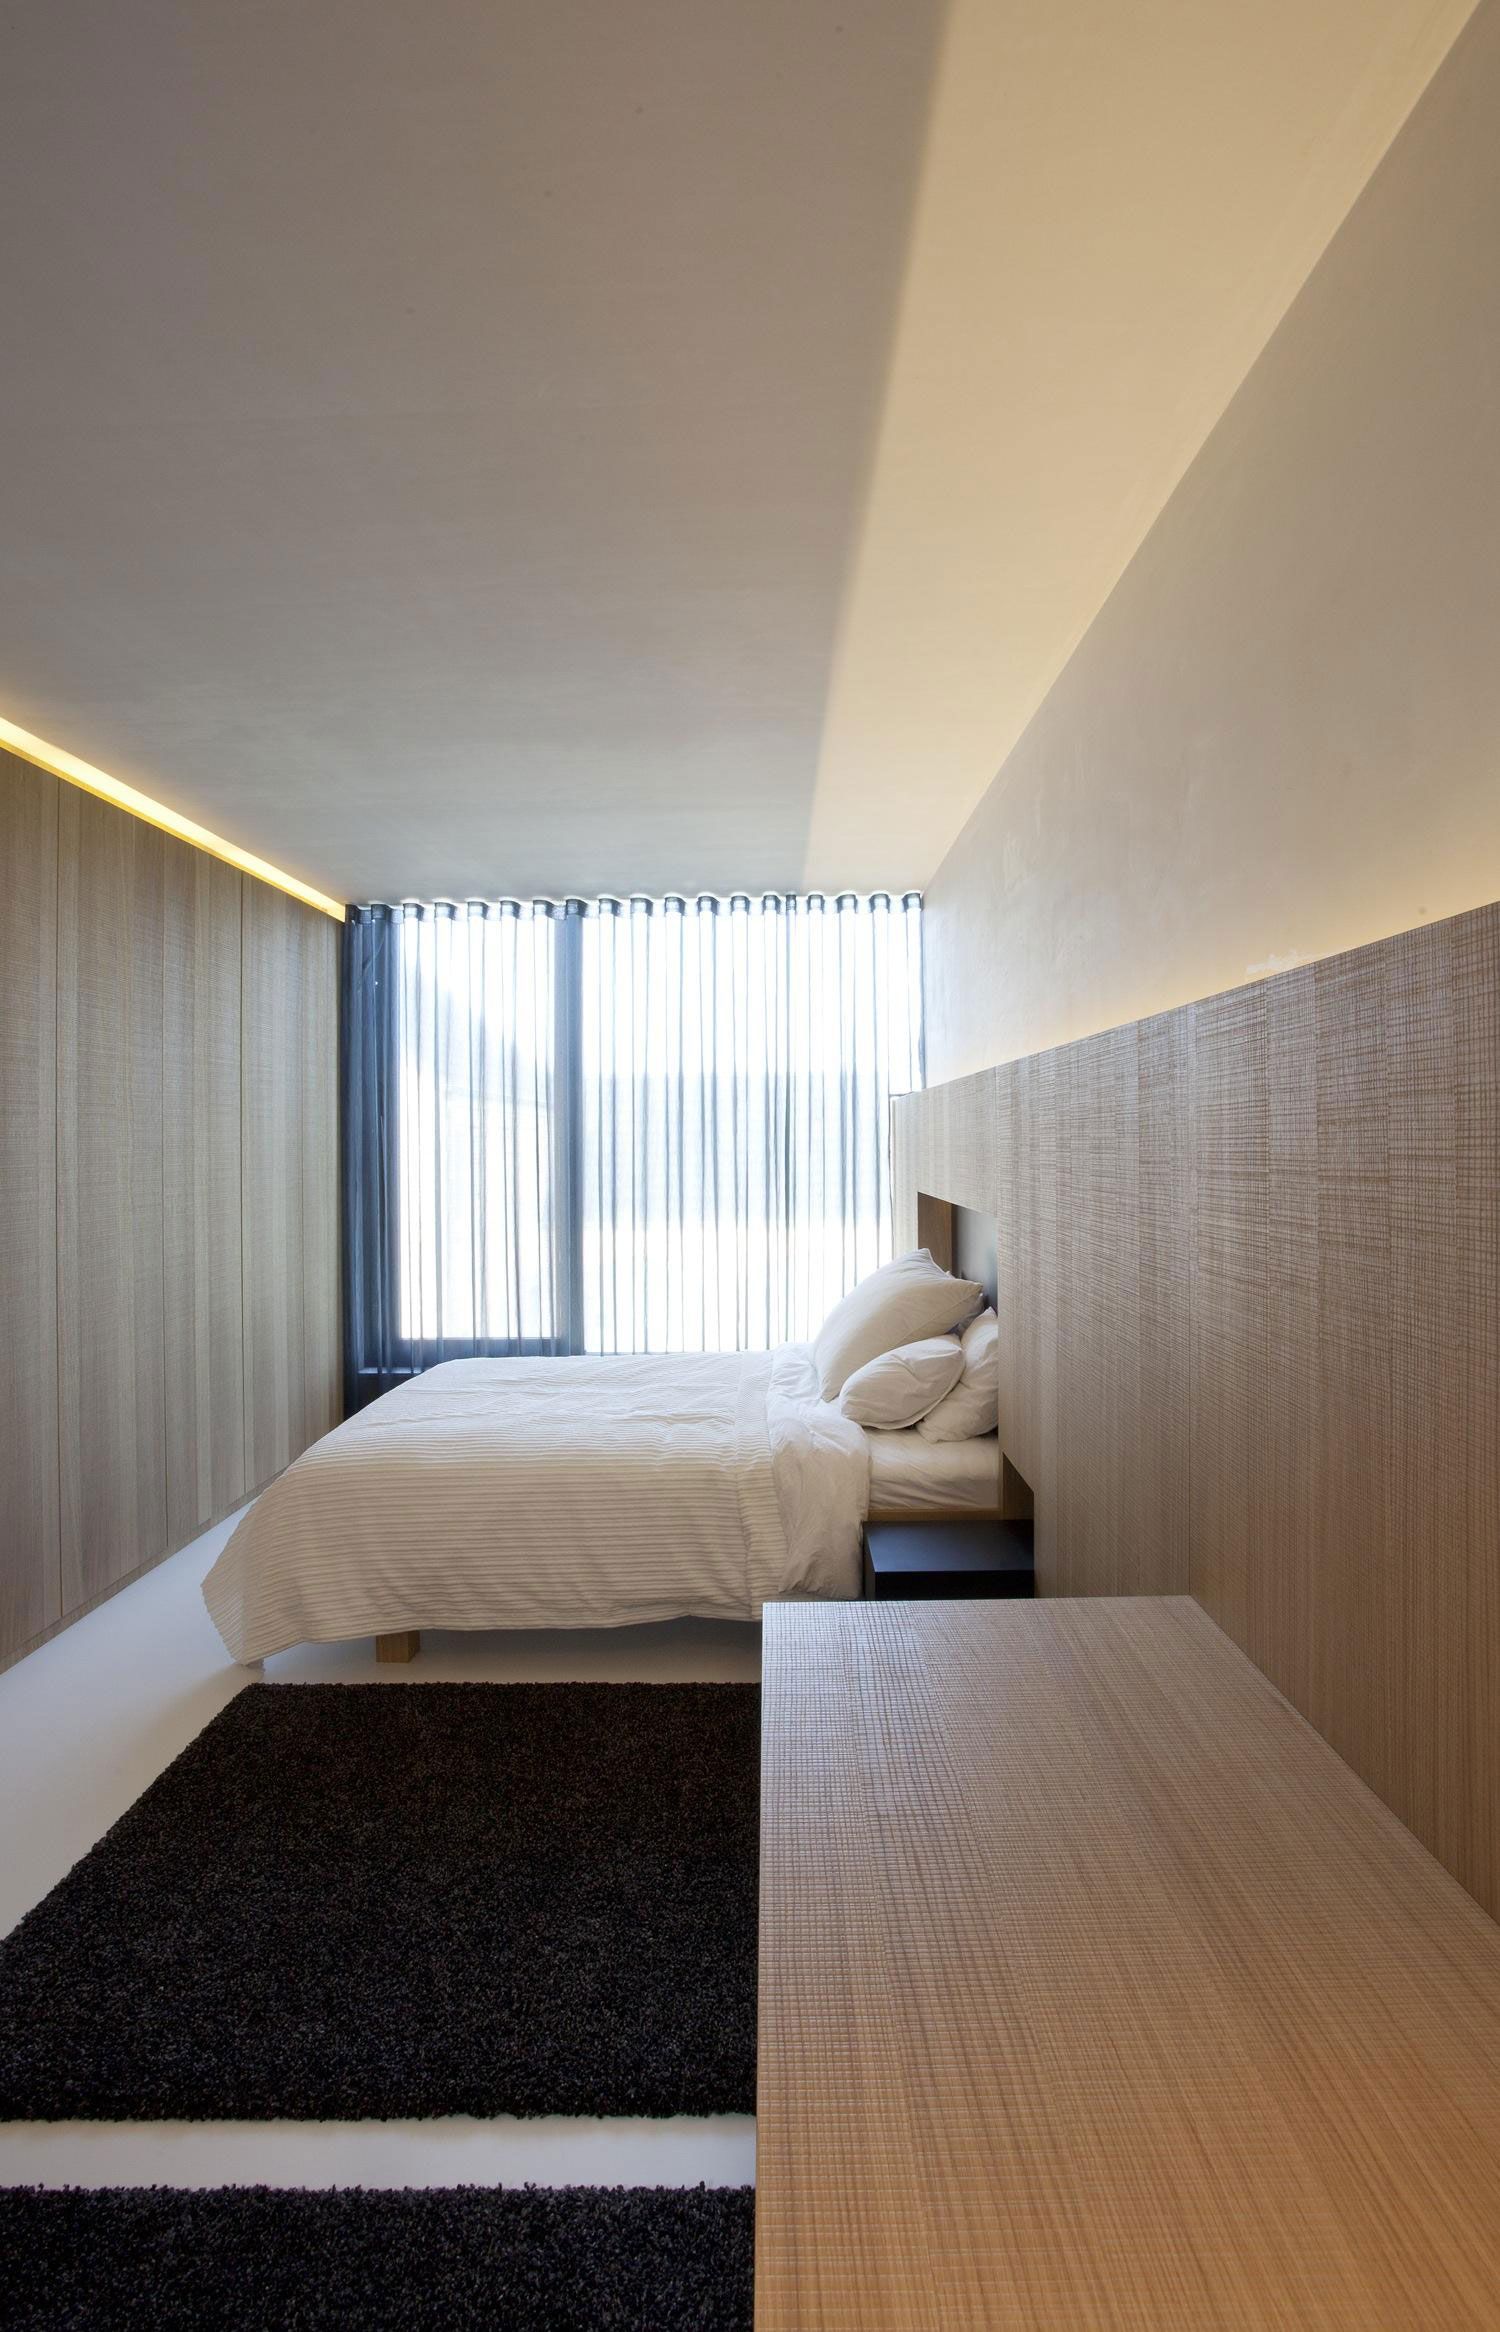 Minimalist Hotel Room: Pin By Solm33 Media On Interior